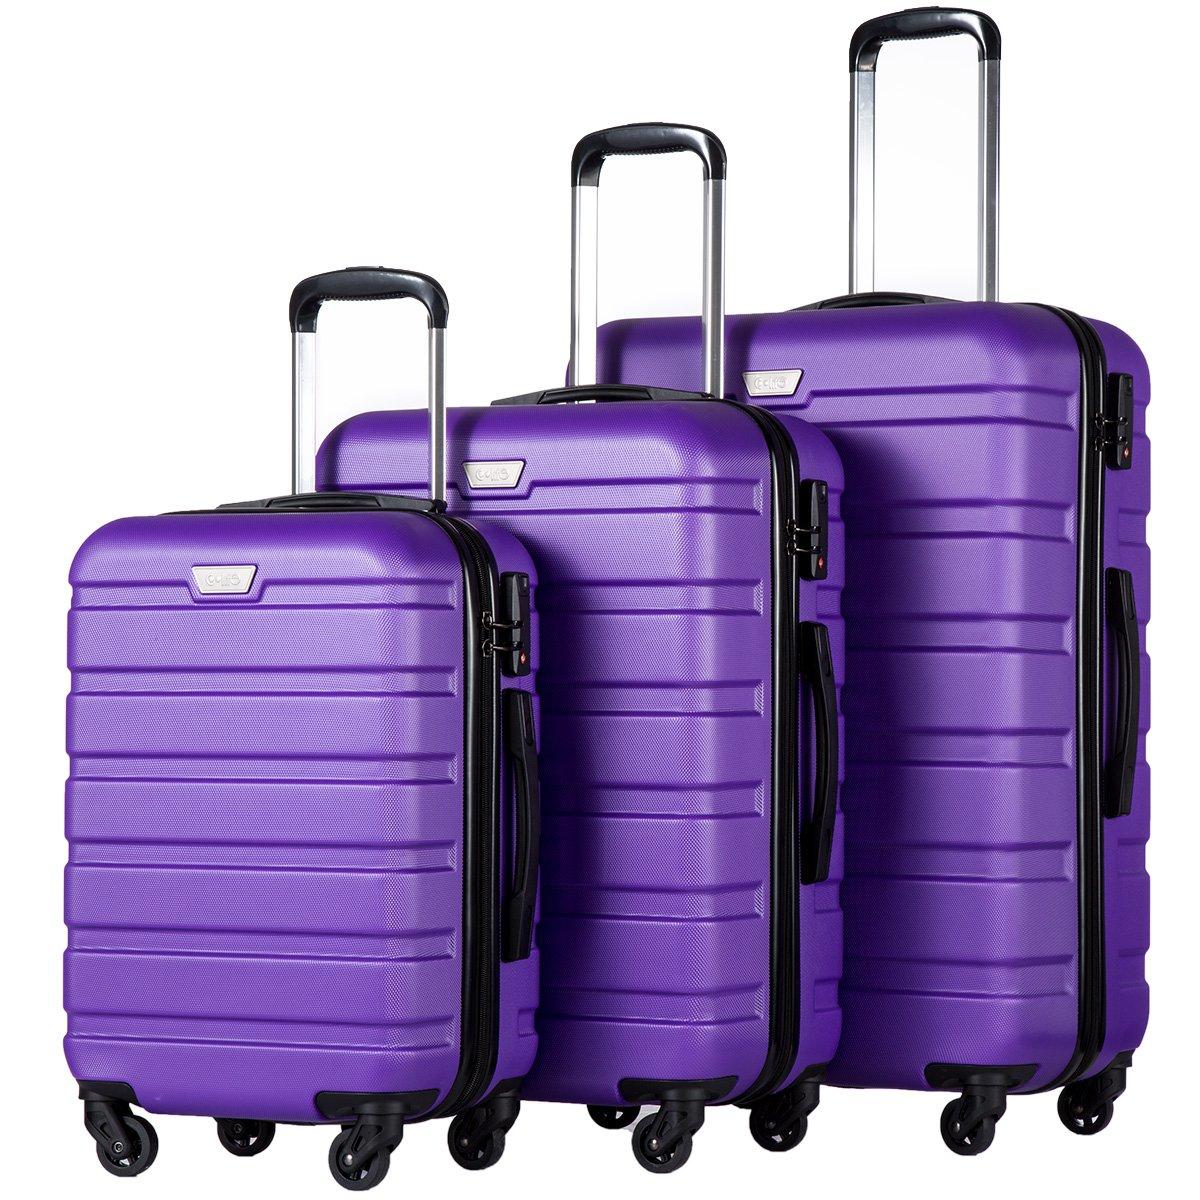 Coolife Luggage 3 Piece Set Suitcase Spinner Hardshell Lightweight (purple2)